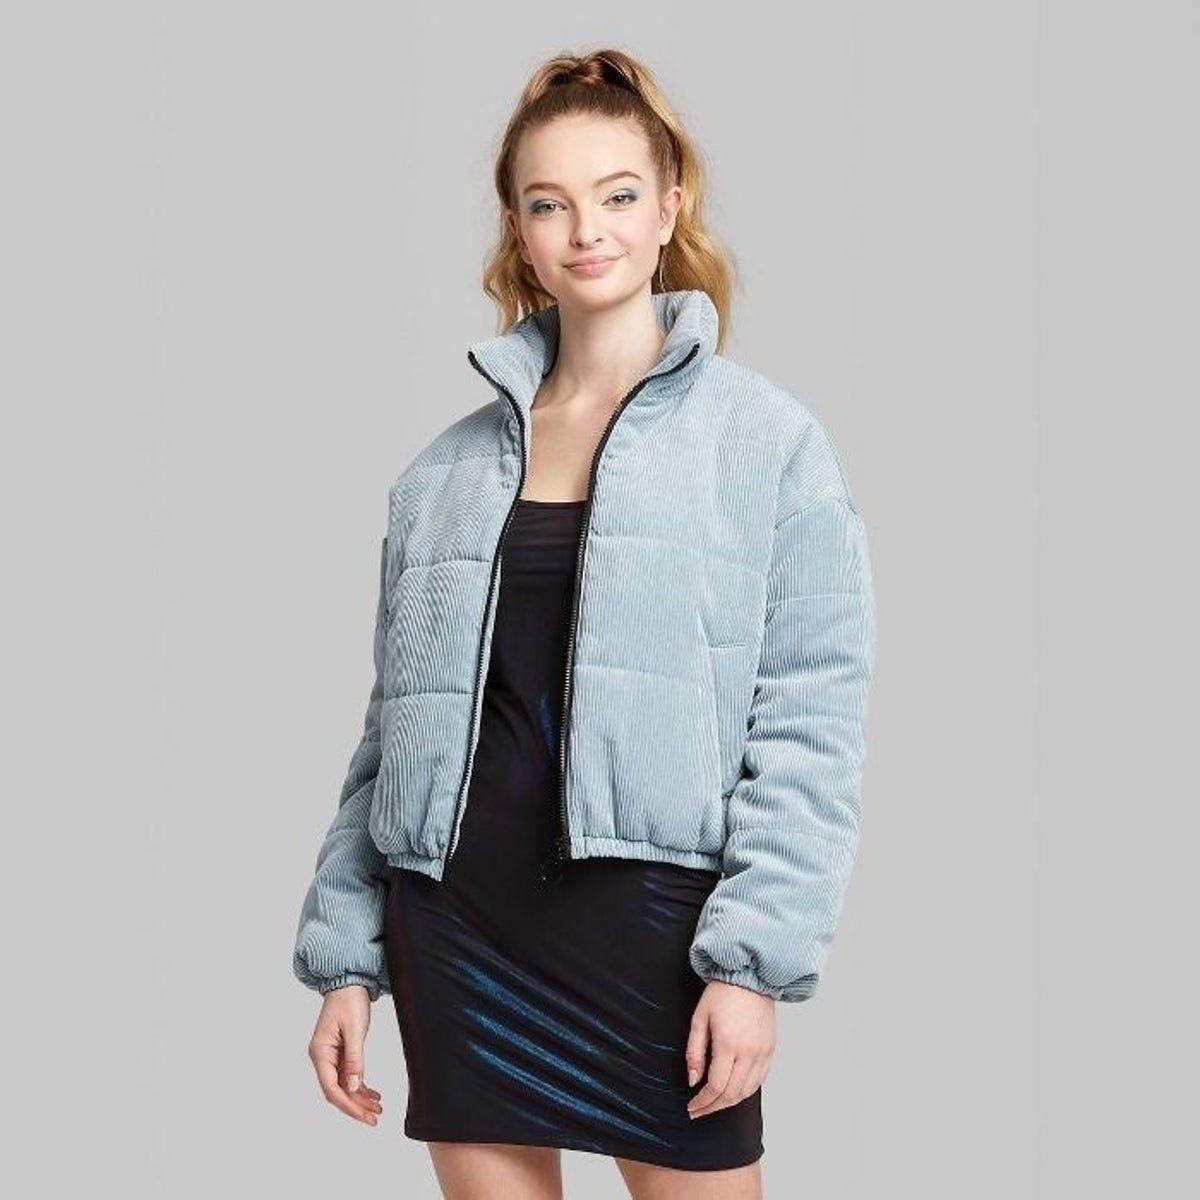 Corduroy Zip Up Puffer Jacket Puffer Jacket Women Blue Puffer Jacket Puffer Jackets [ 1200 x 1200 Pixel ]